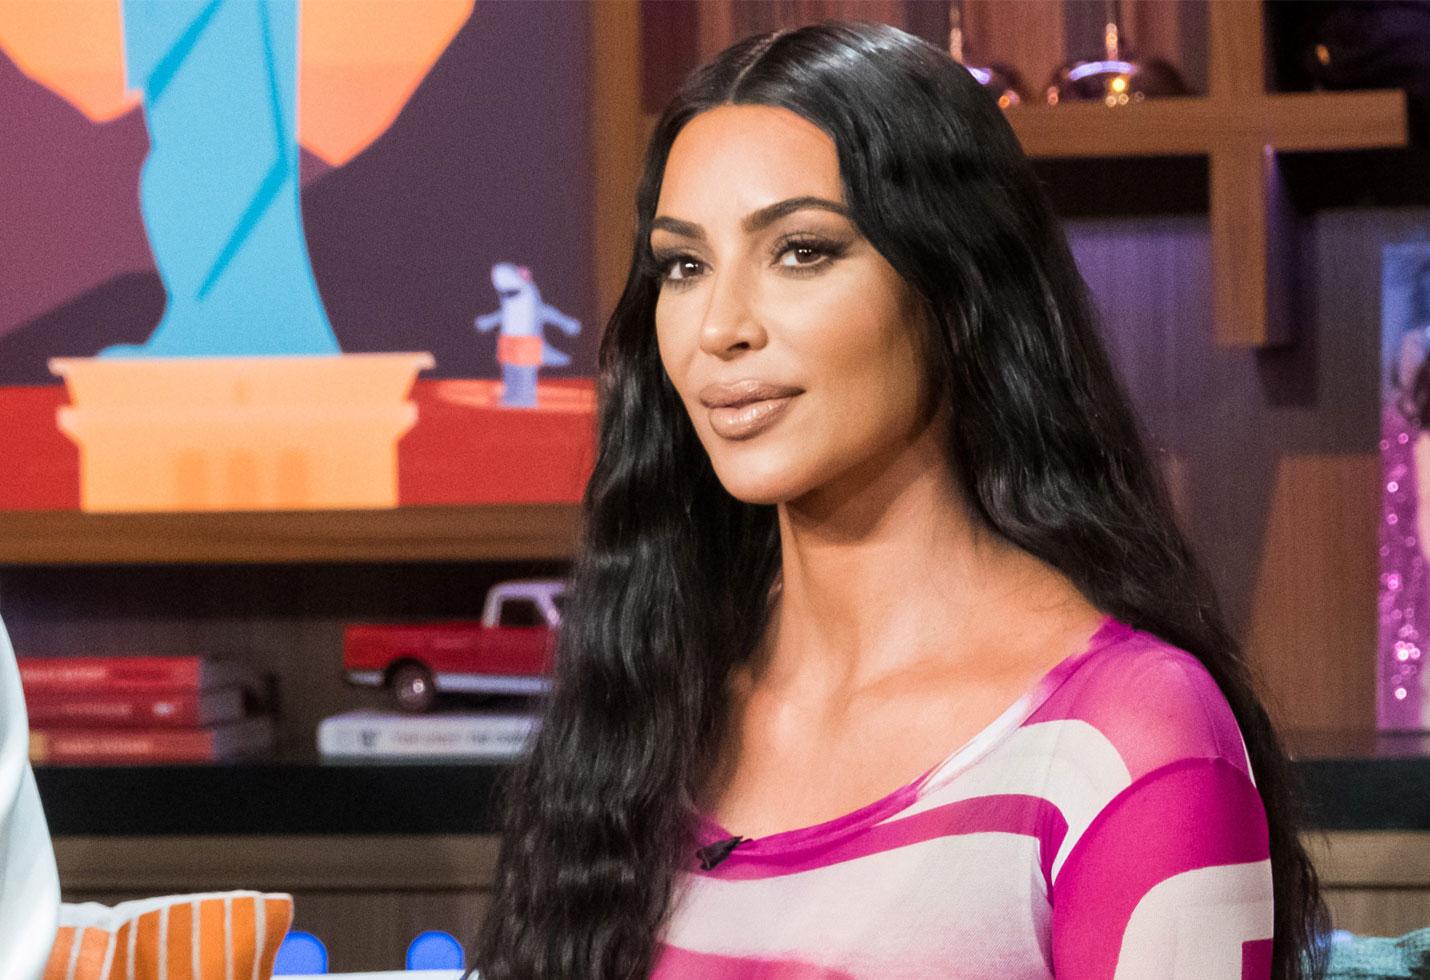 Kim kardashian plastic surgery fans mimic photos